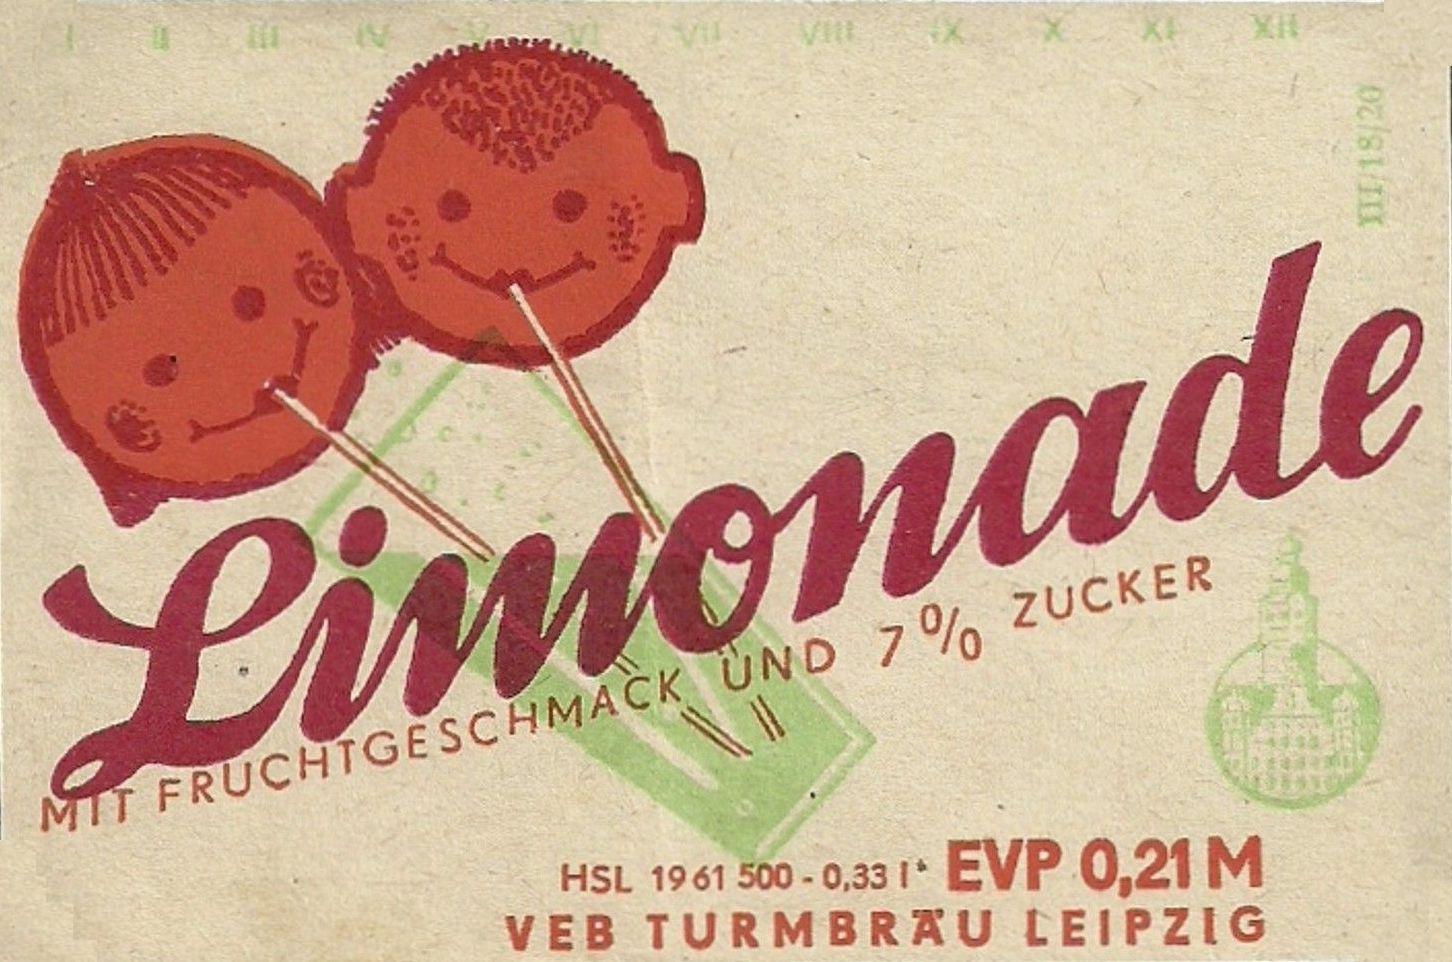 Limonade mit Fruchtgeschmack, VEB Turmbräu Leipzig (Bild: historisches Etikett)